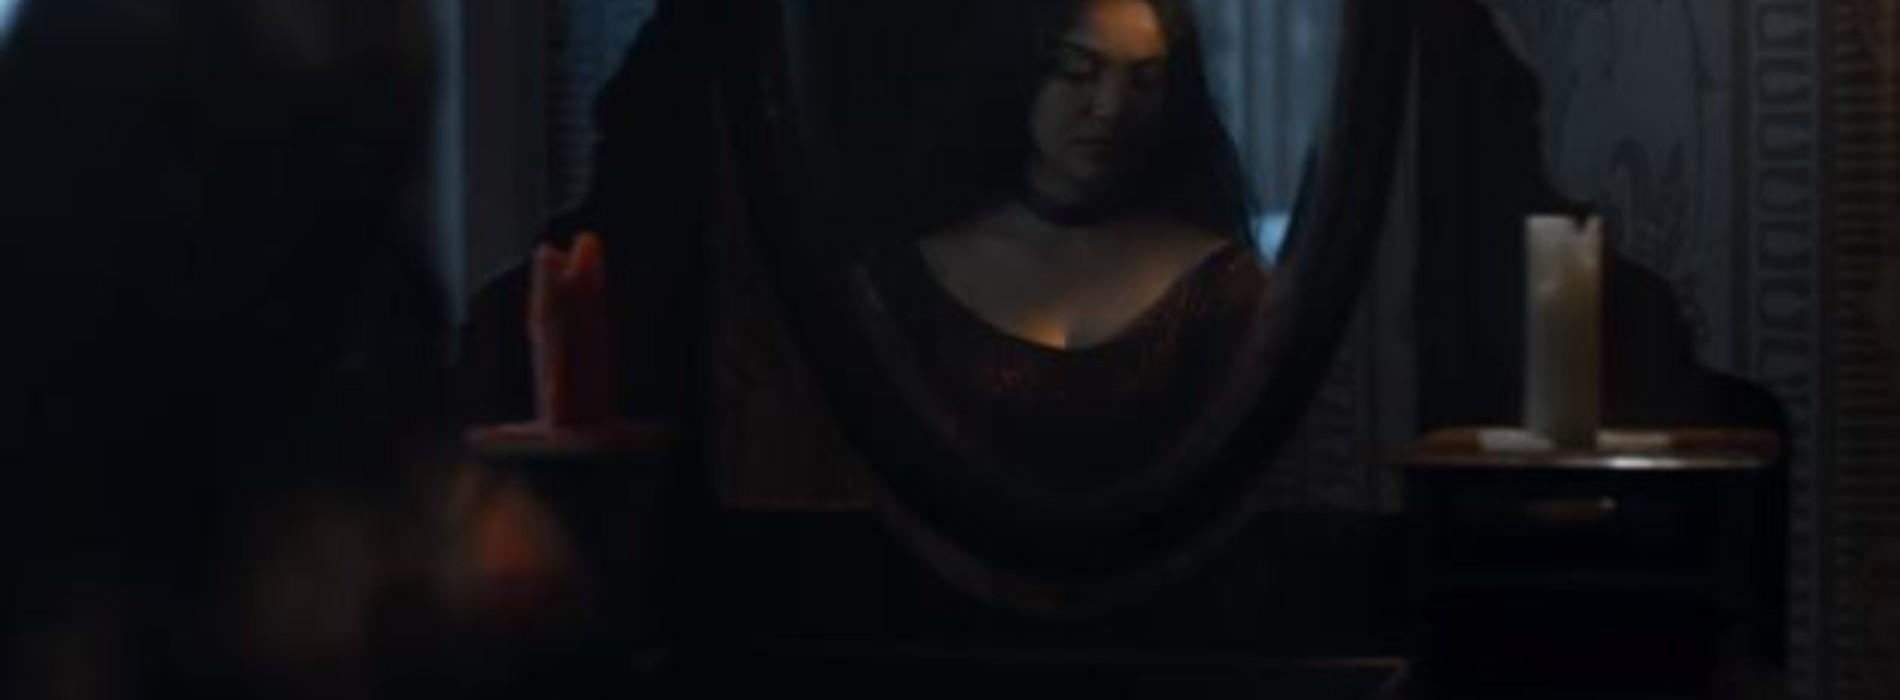 Ridma Weerawardena Ft Dinupa Kodagoda & Charitha Attalage – Kuweni (කුවේණී) [Official Video]